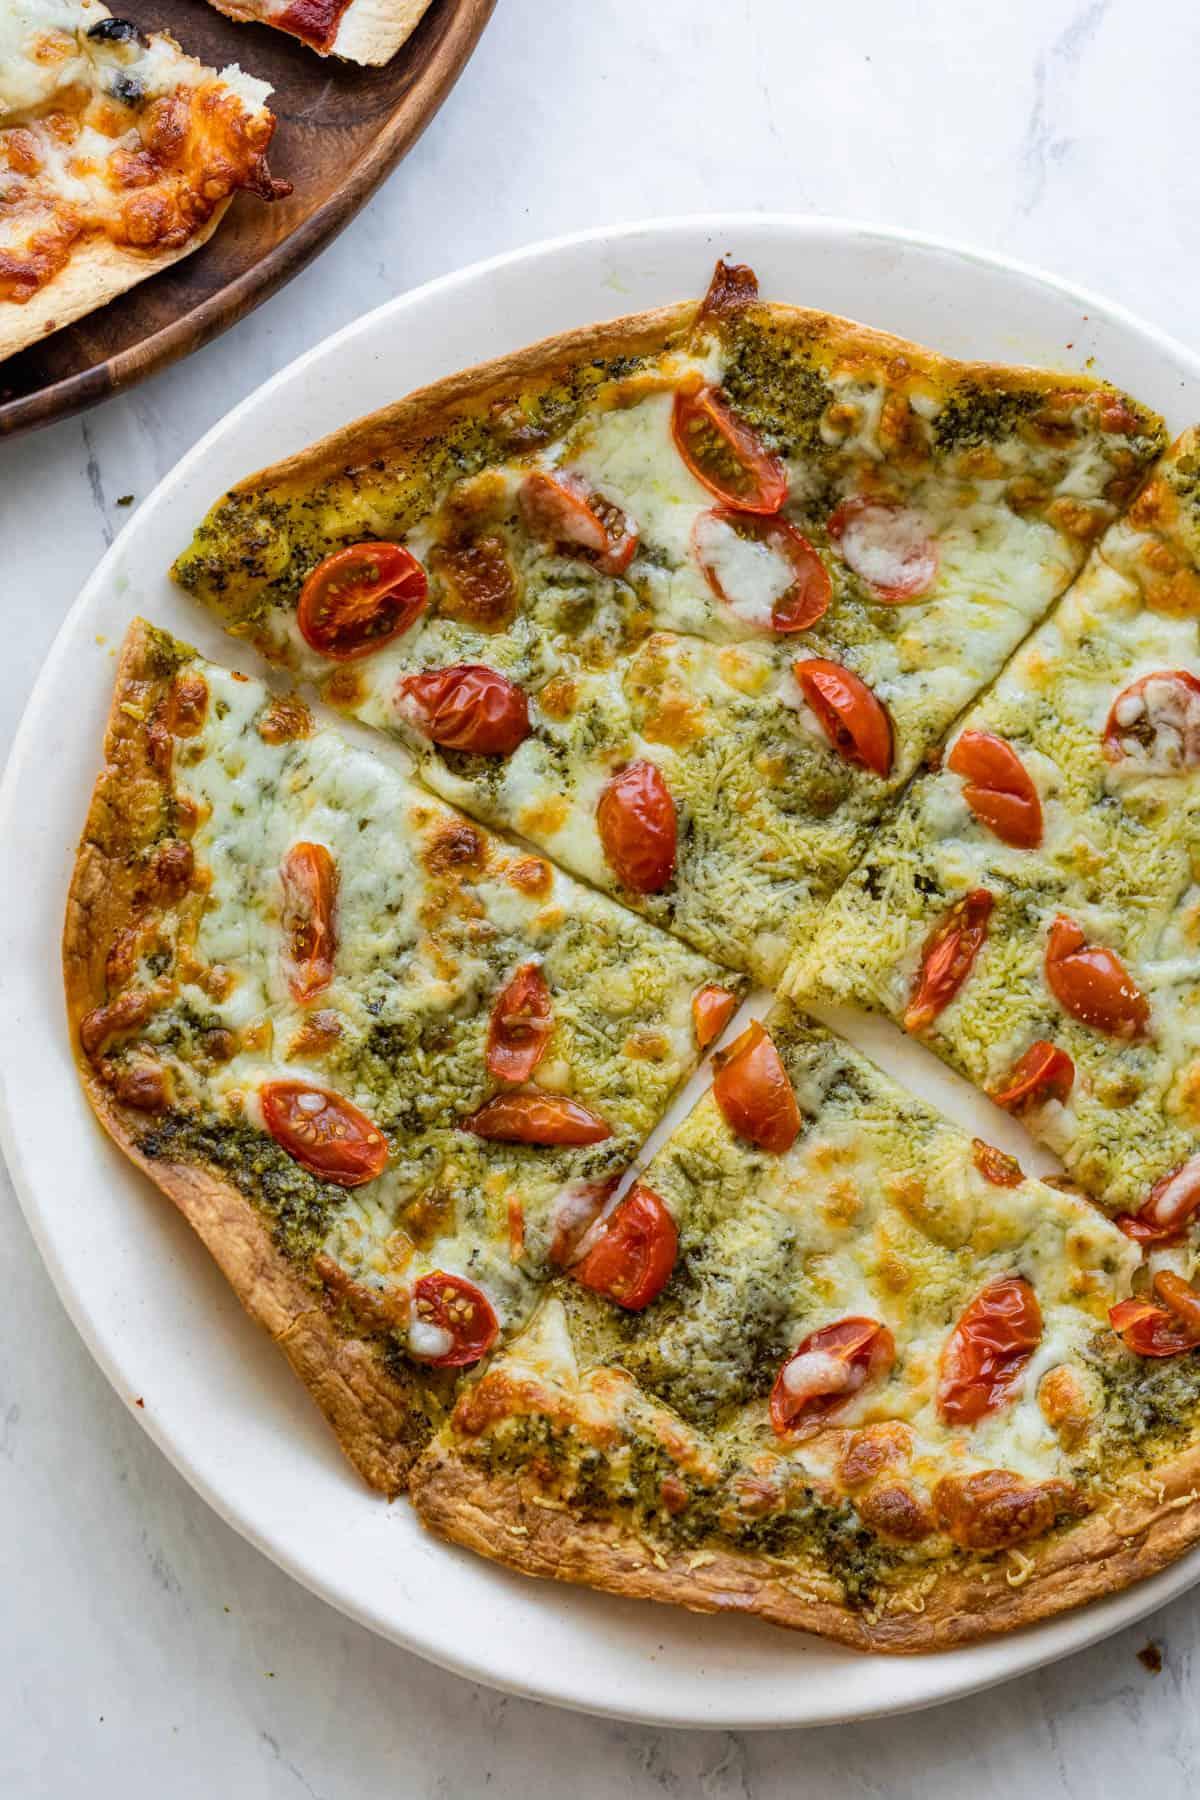 Pesto tortilla pizza sliced into four slices